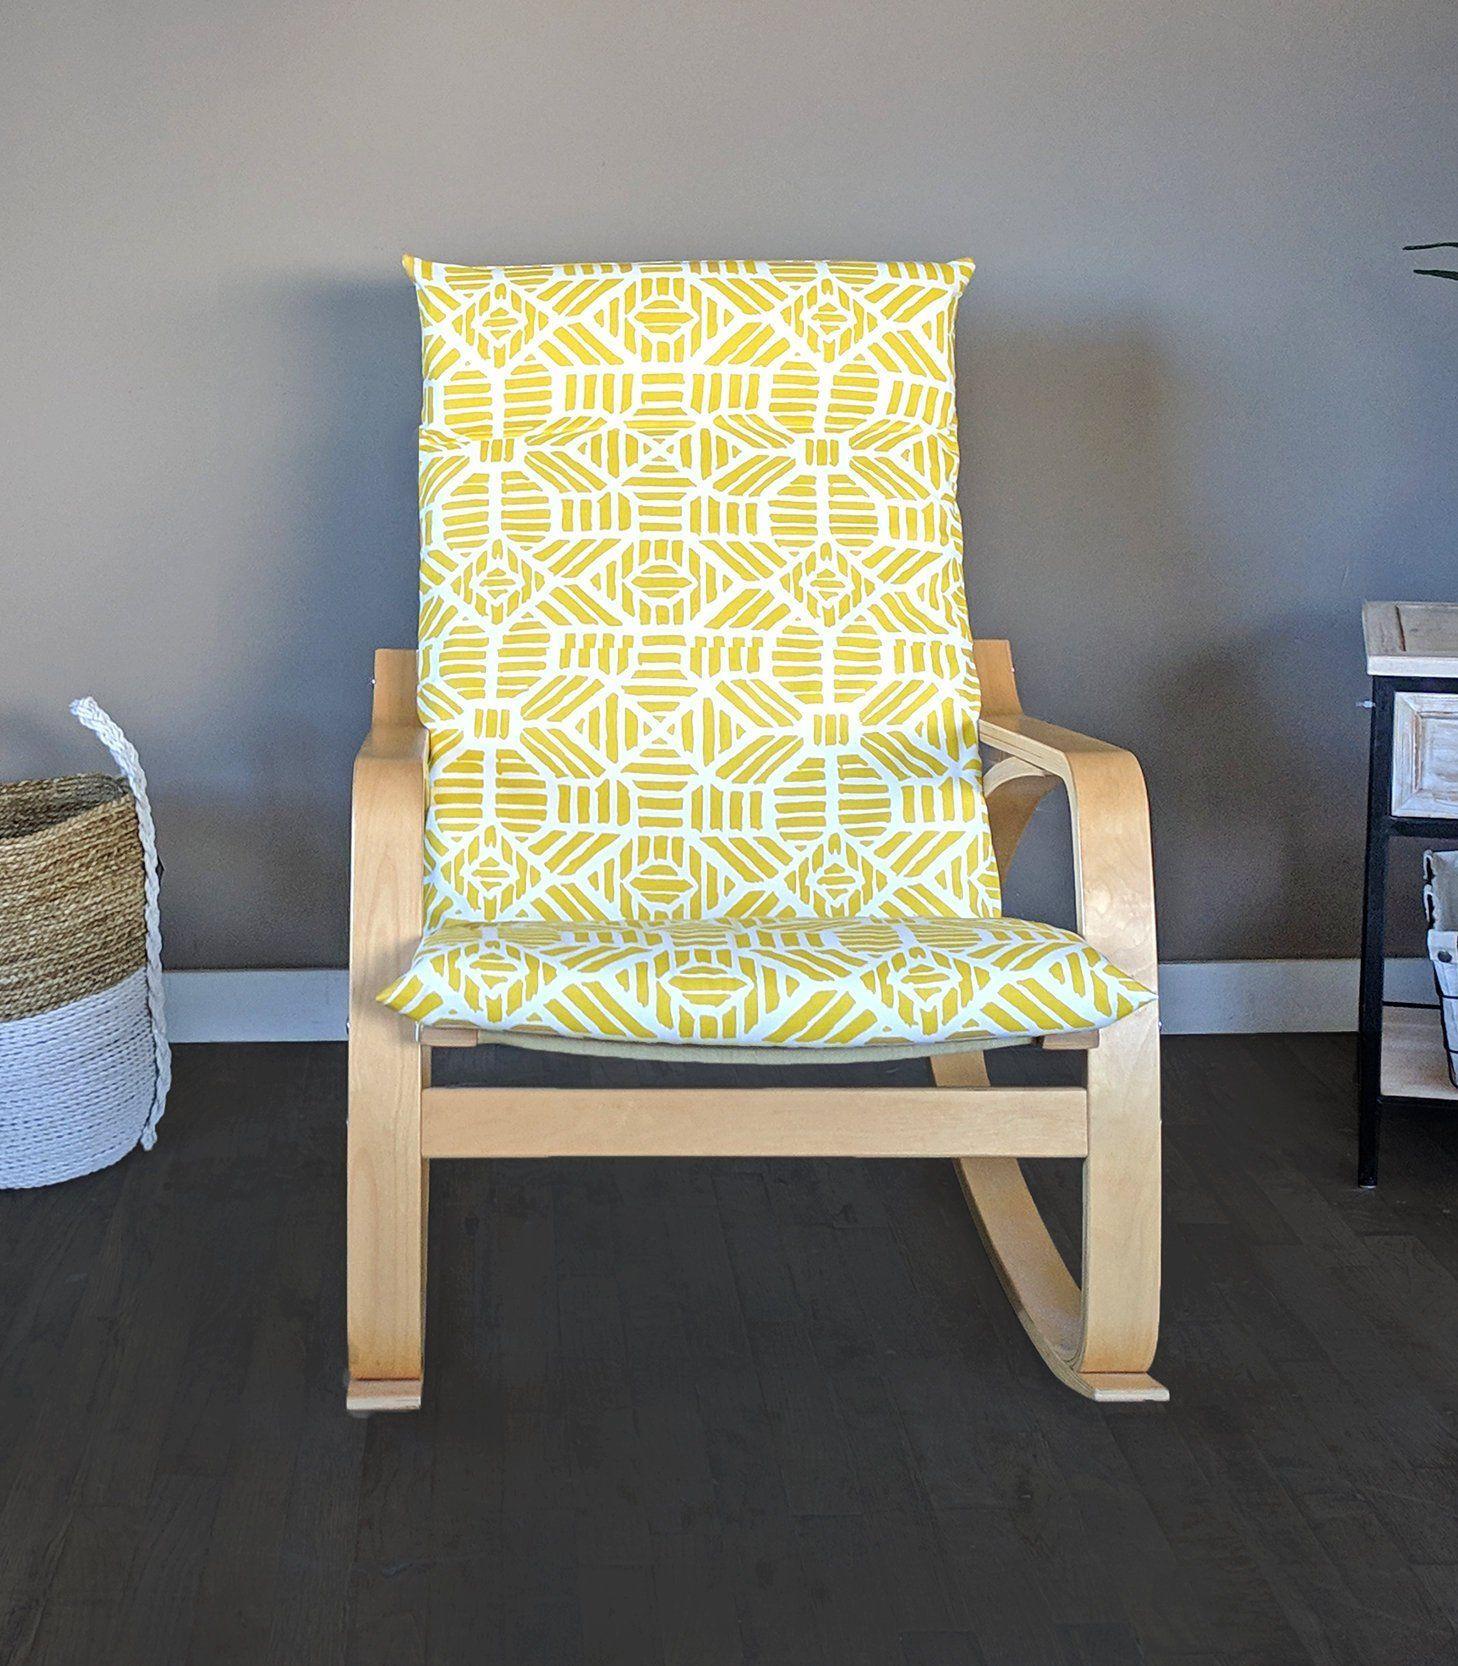 Aztech Yellow Unique IKEA POÄNG Cushion Slipcover